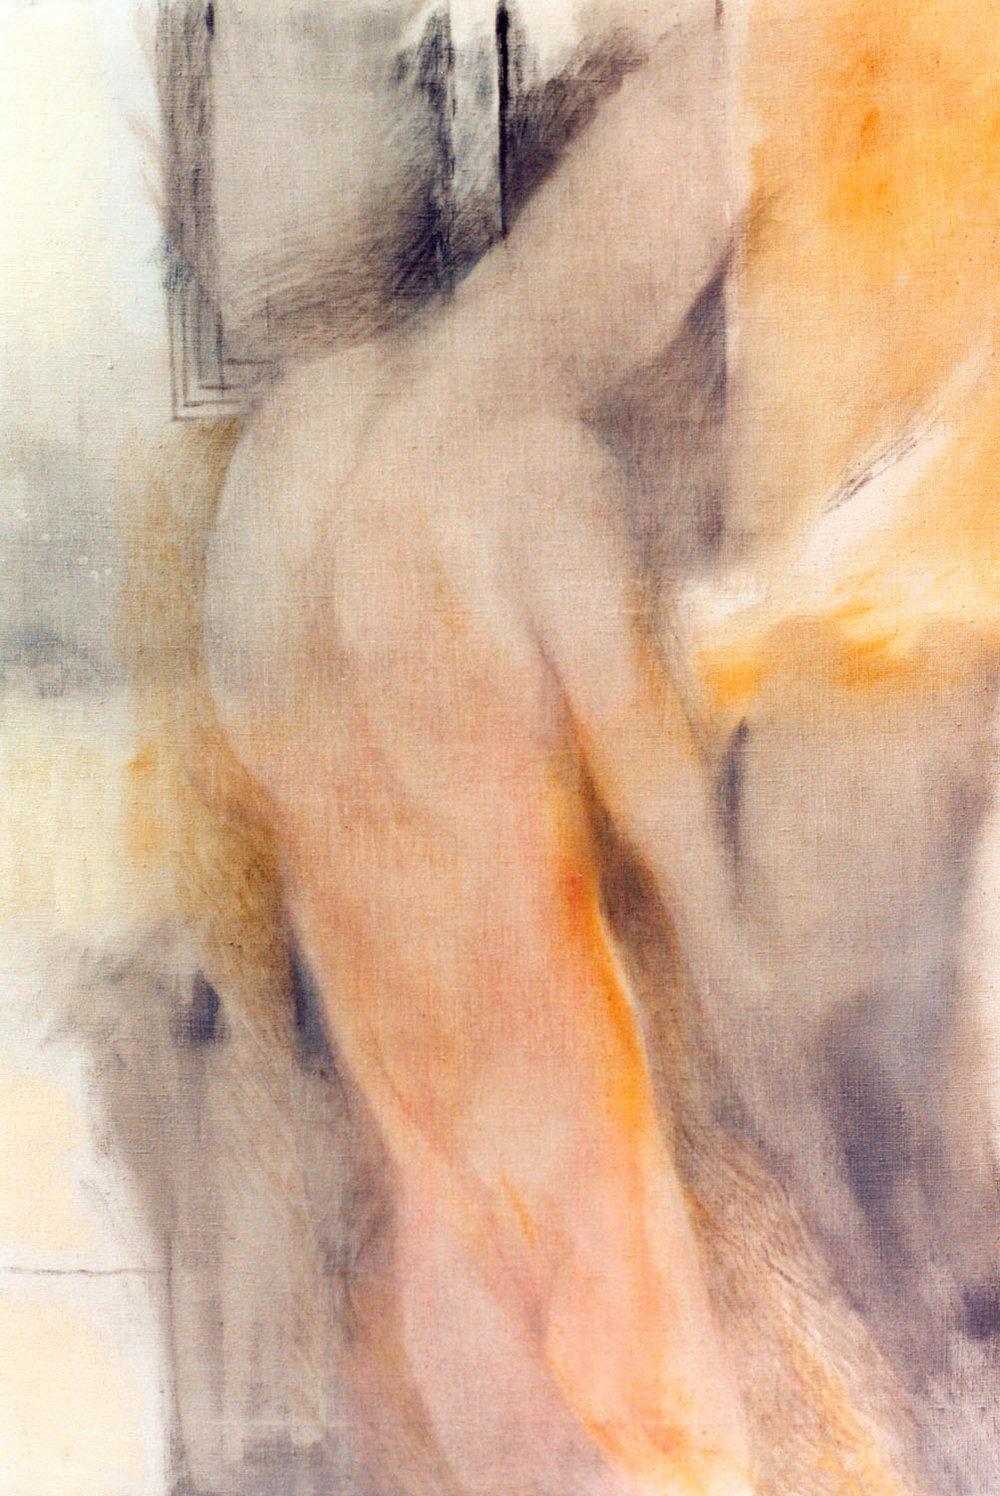 nude-1-91.jpg